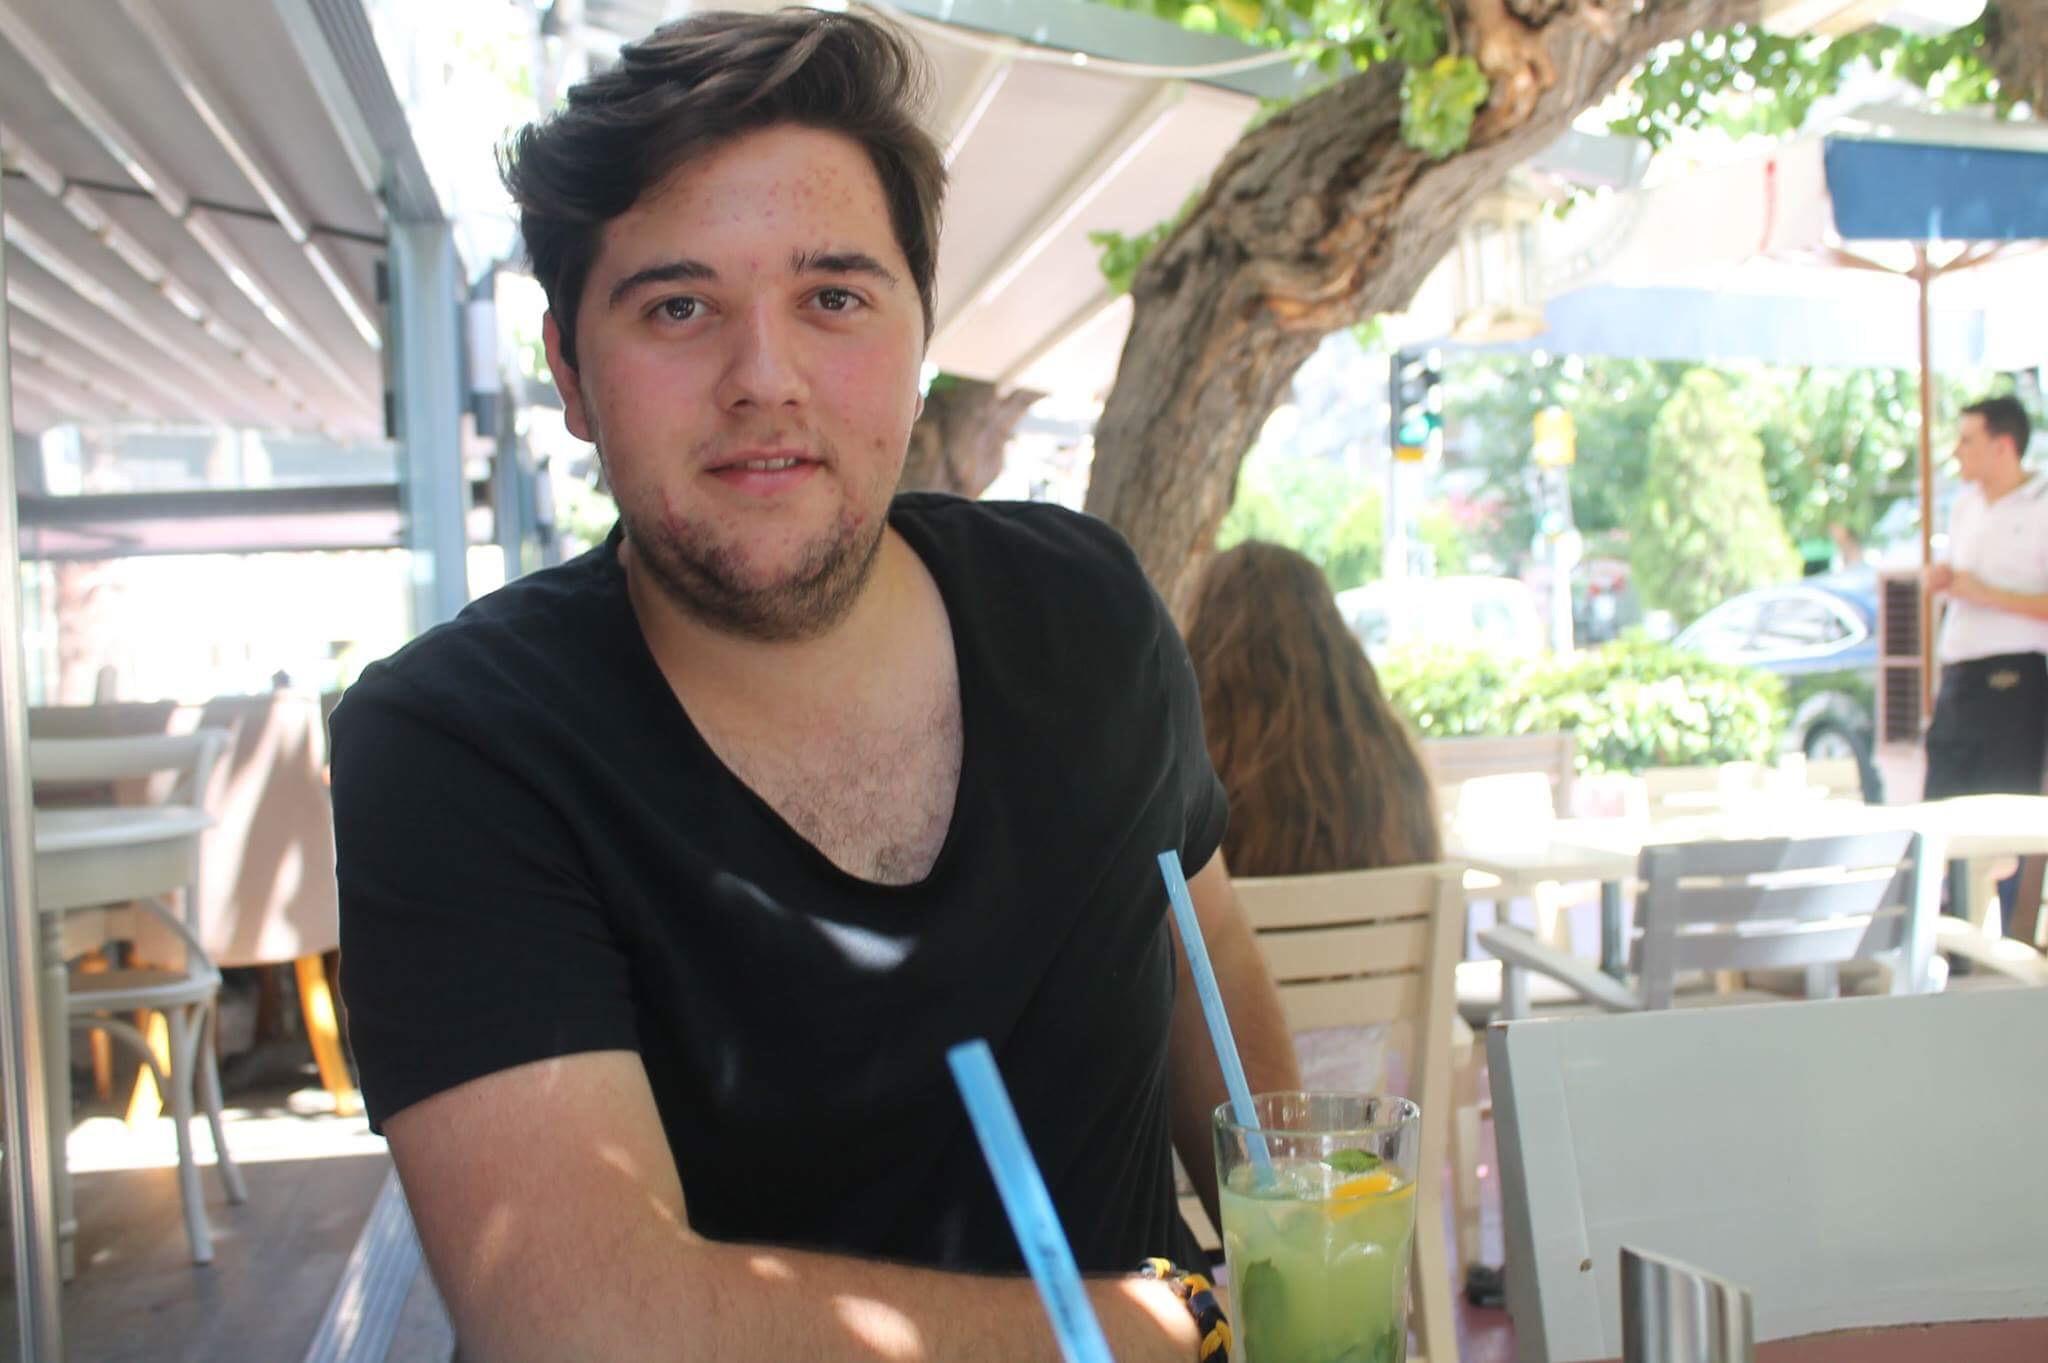 Utku Mutlu<br/><span>Ankara, Turkey</span>